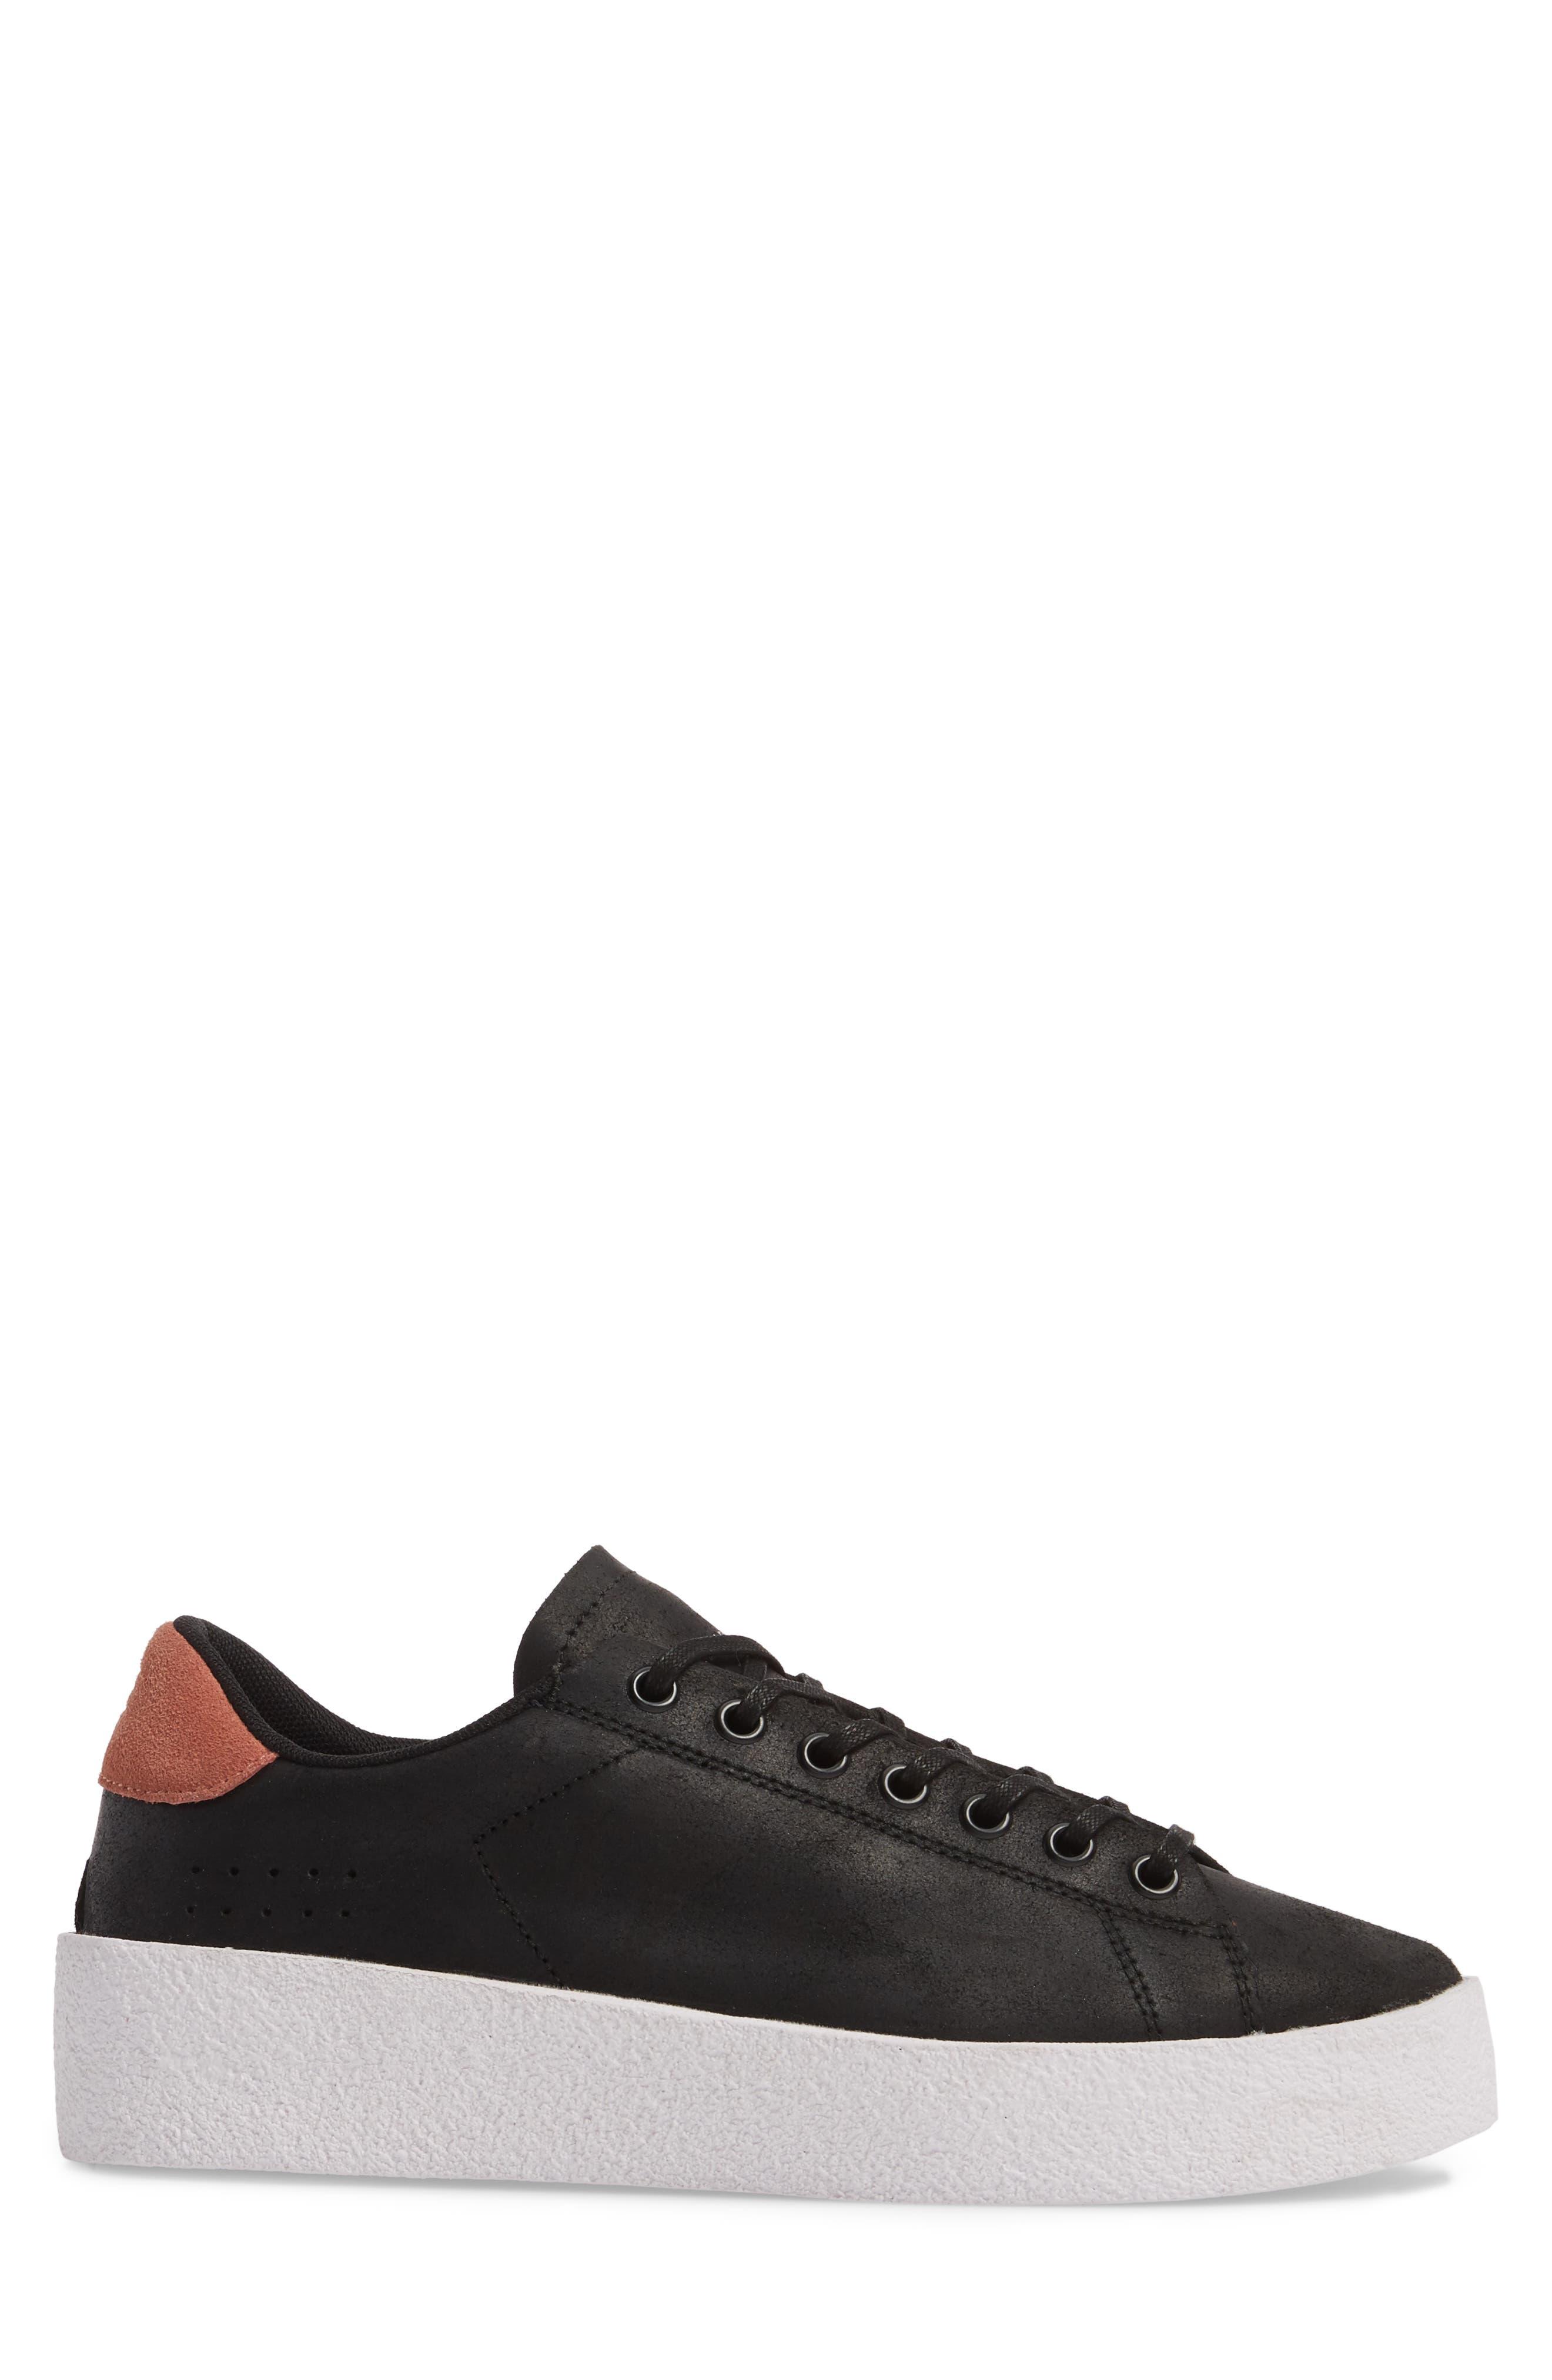 Jones Platform Sneaker,                             Alternate thumbnail 3, color,                             Black Leather